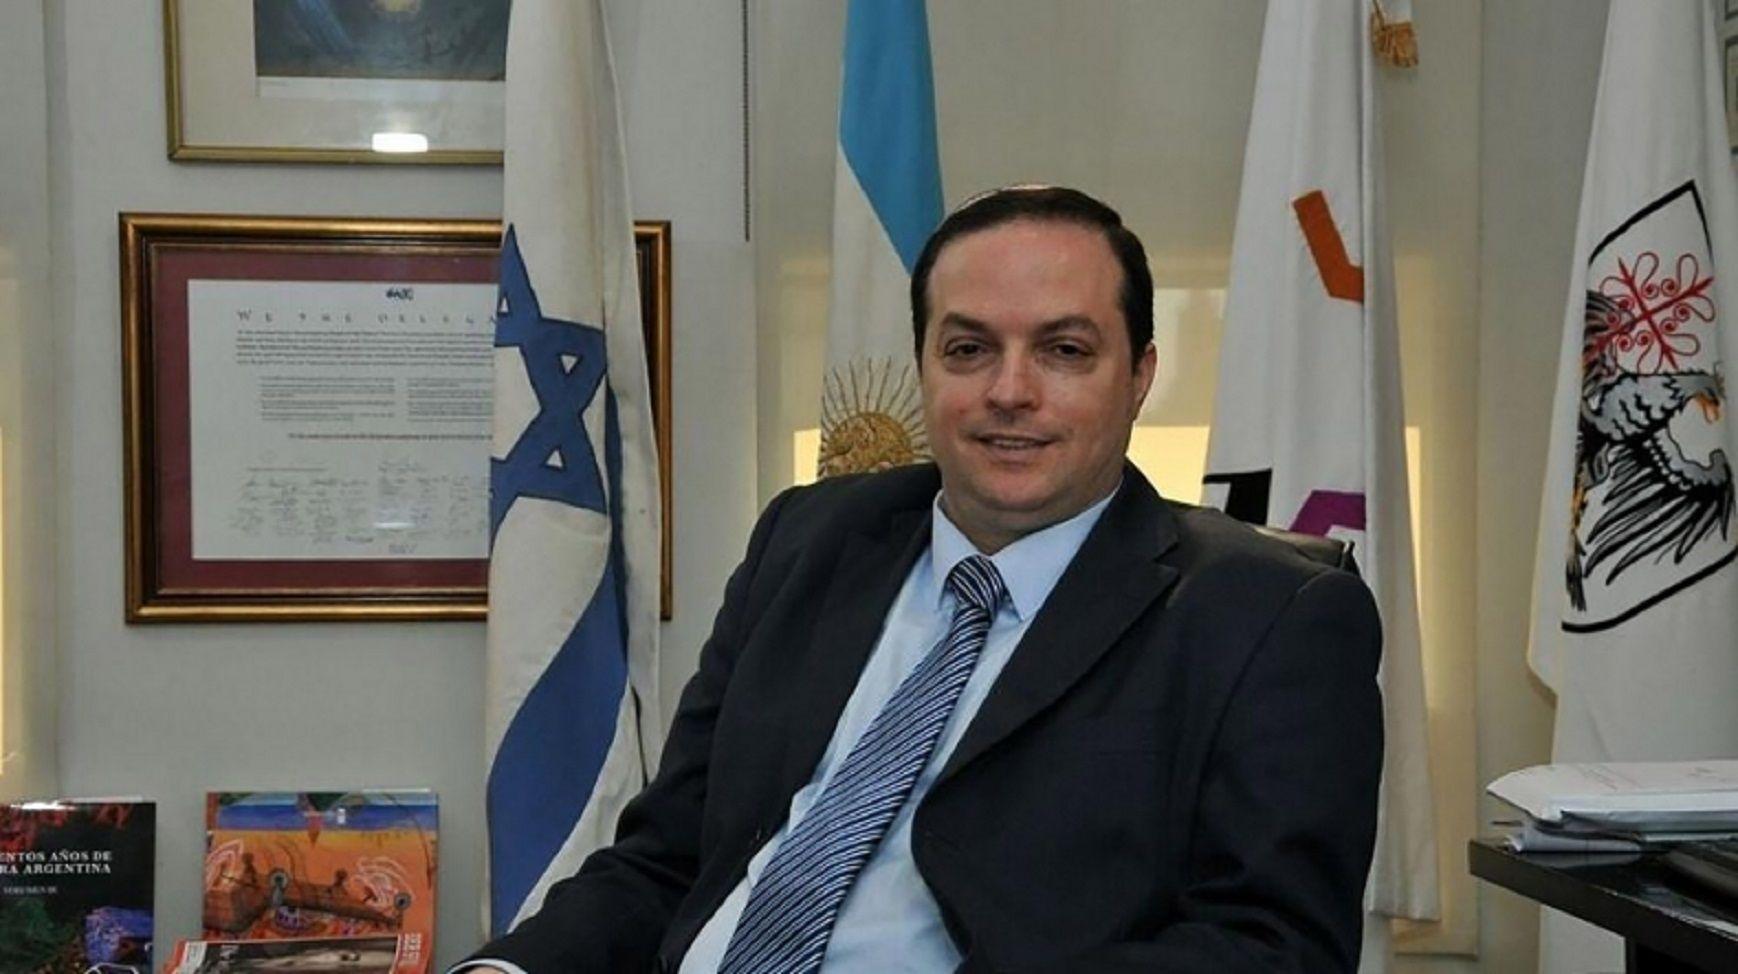 Ariel Cohen Sabban